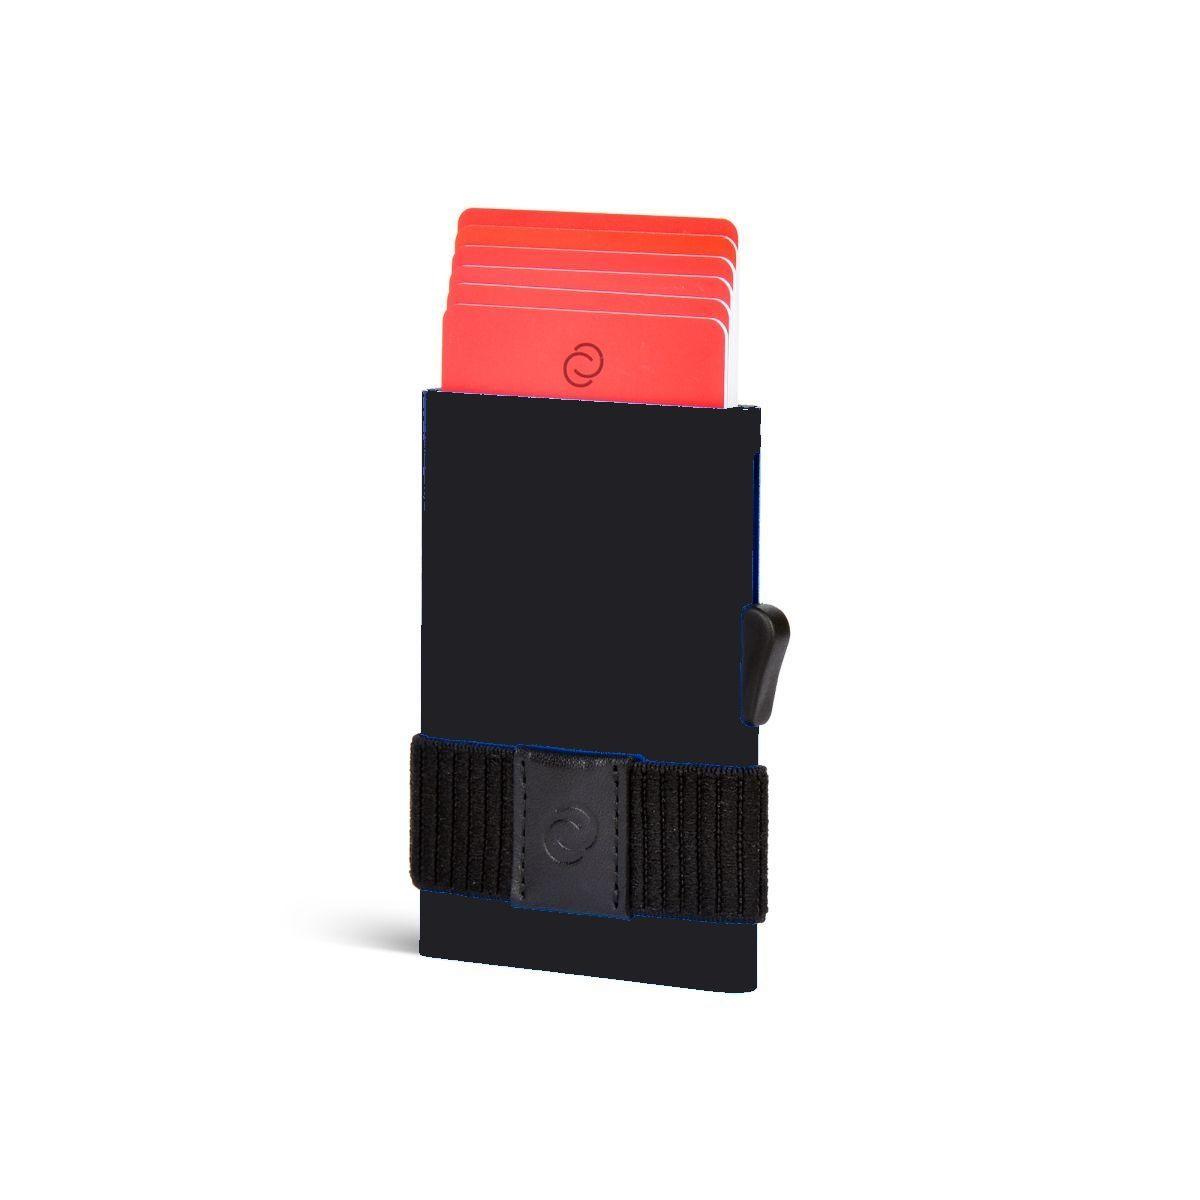 C-Secure ארנק אלומיניום דק עם גומיה לשטרות - שחור